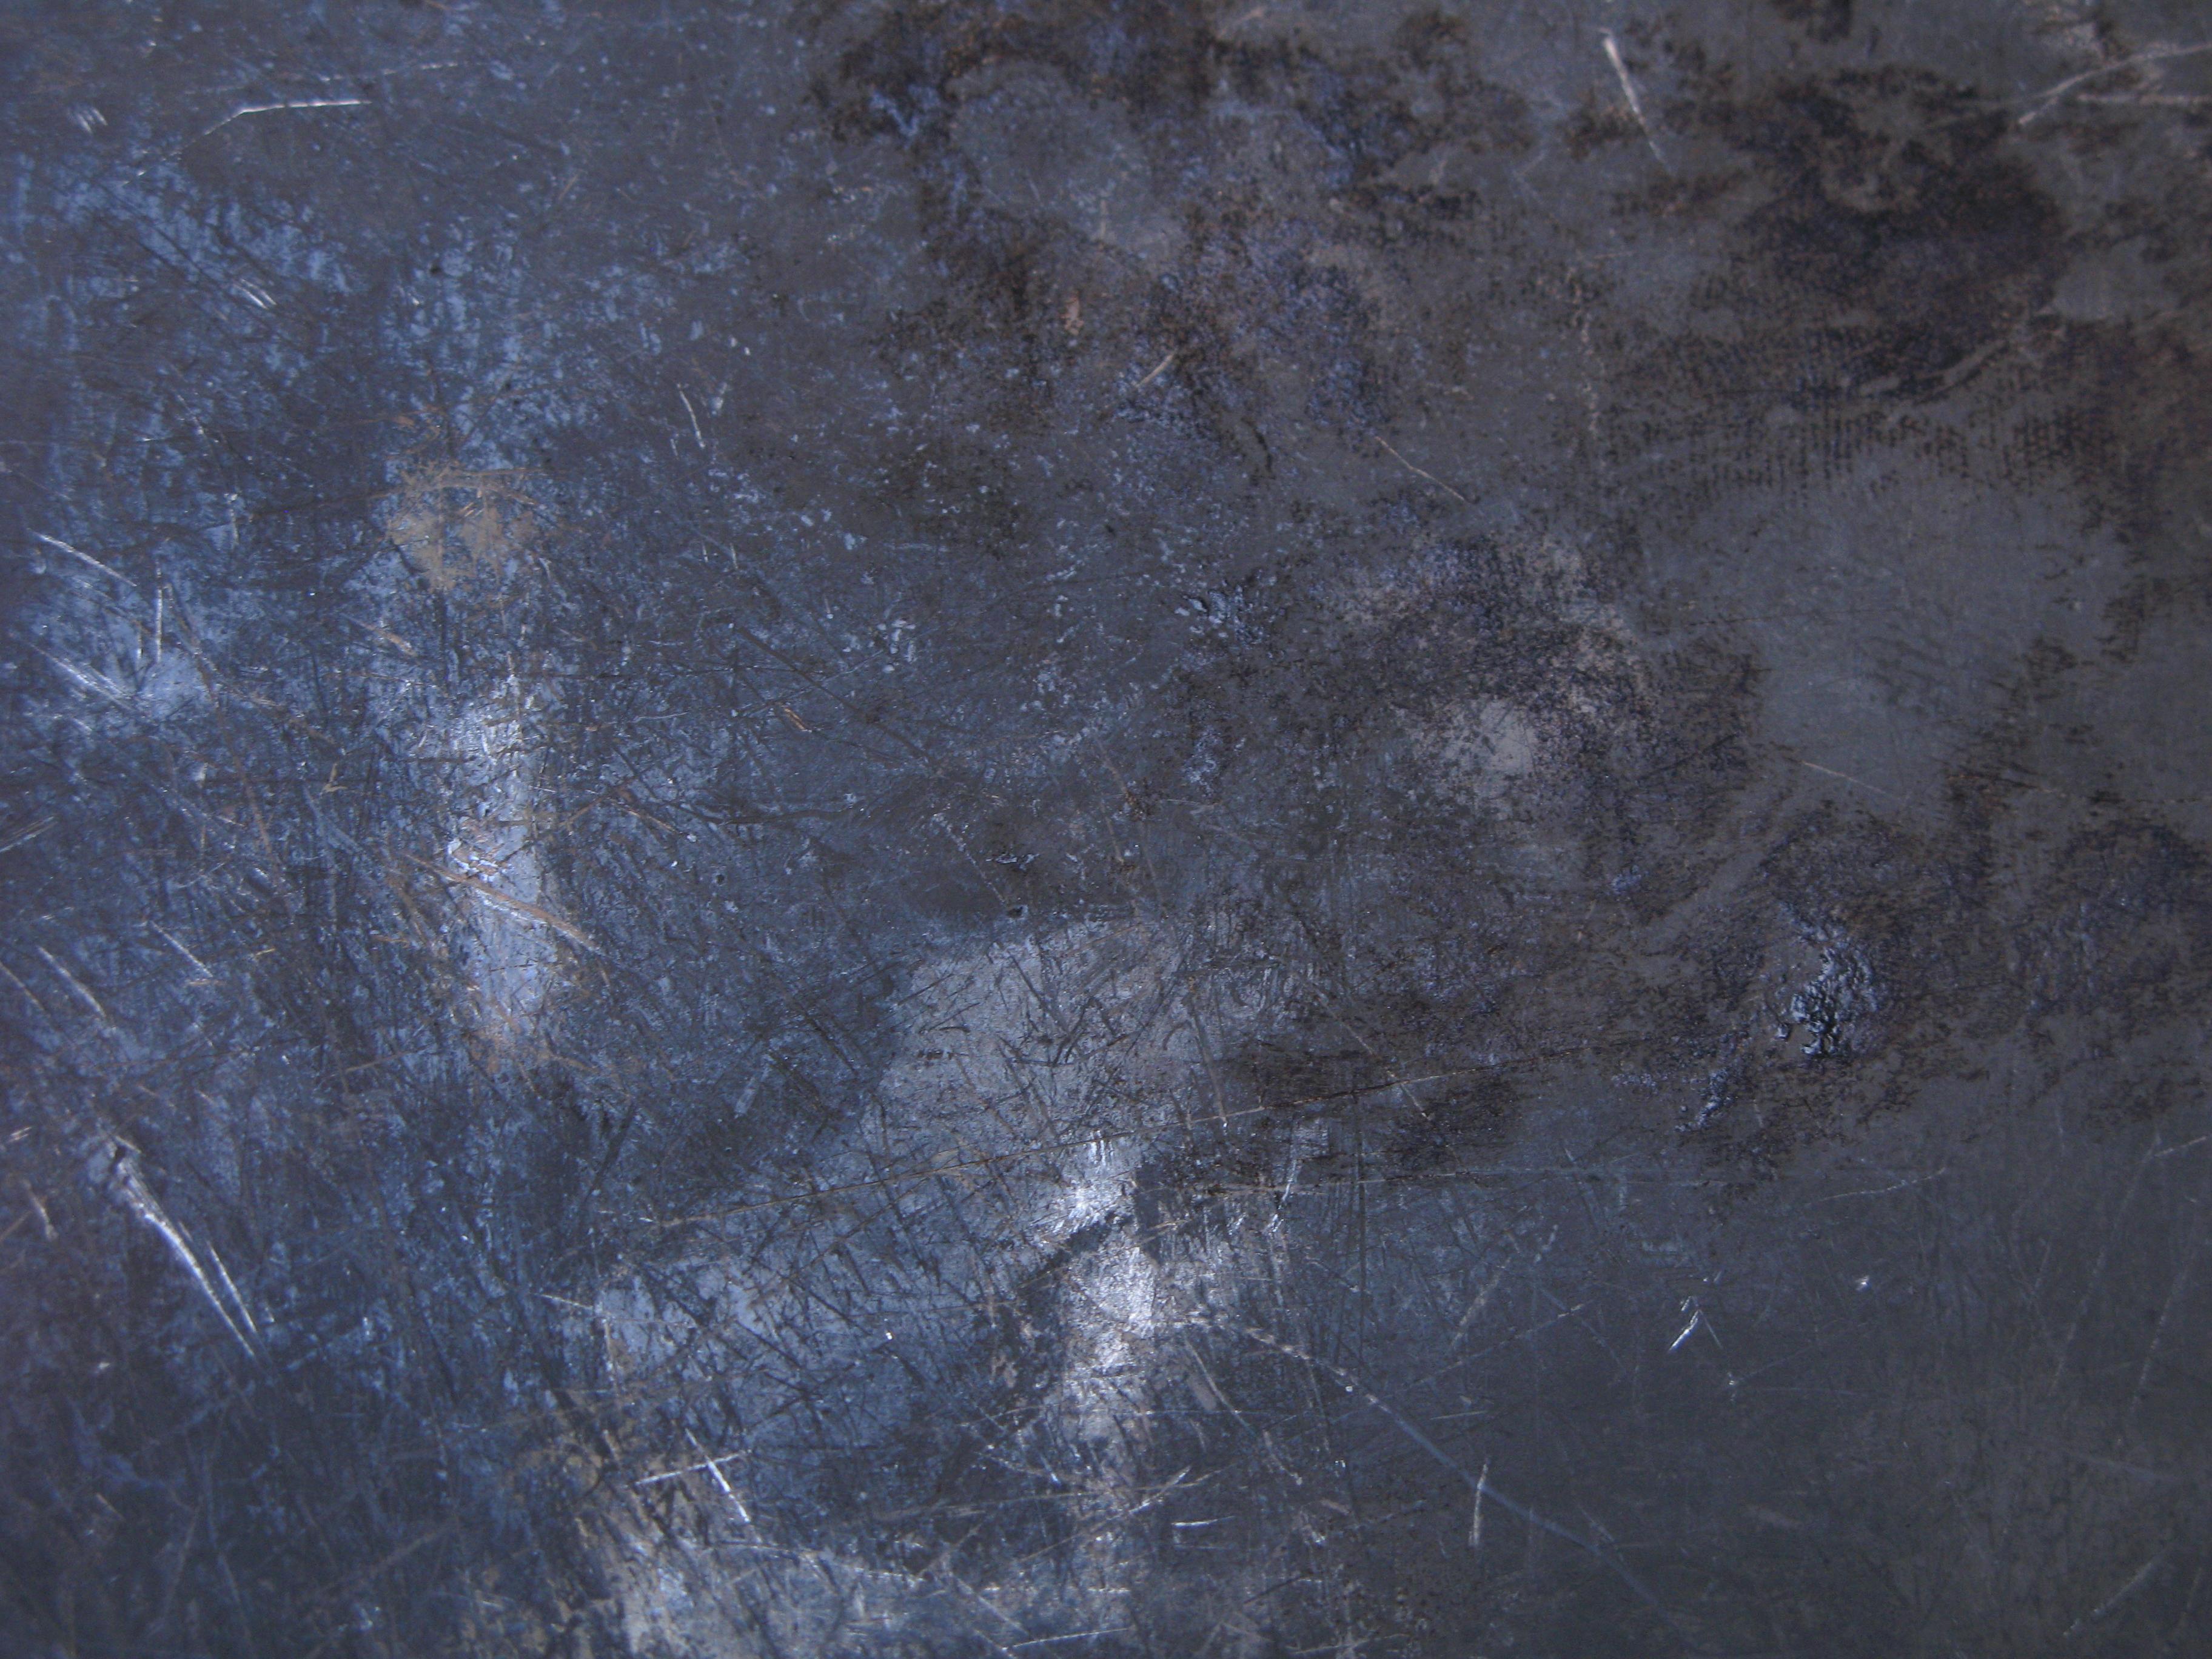 Metallic Textures favourites by PDav0117 on DeviantArt